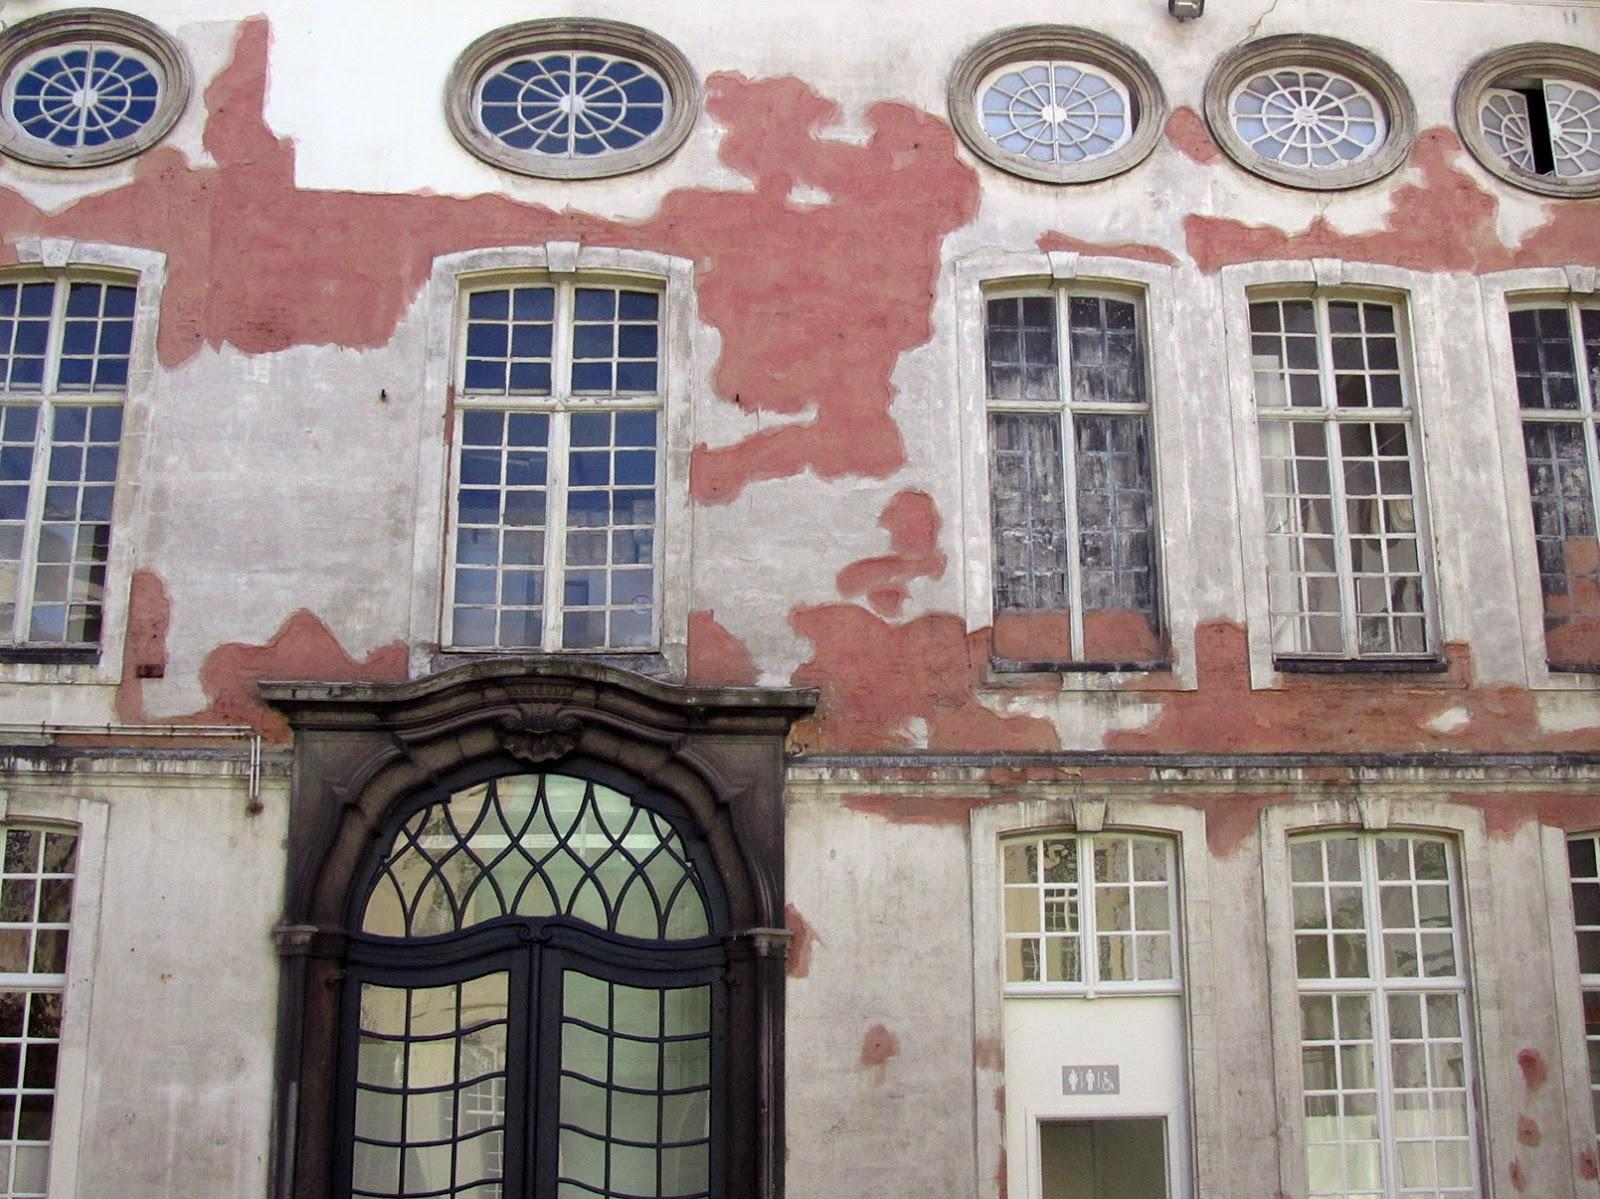 inner court of Design Museum Ghent